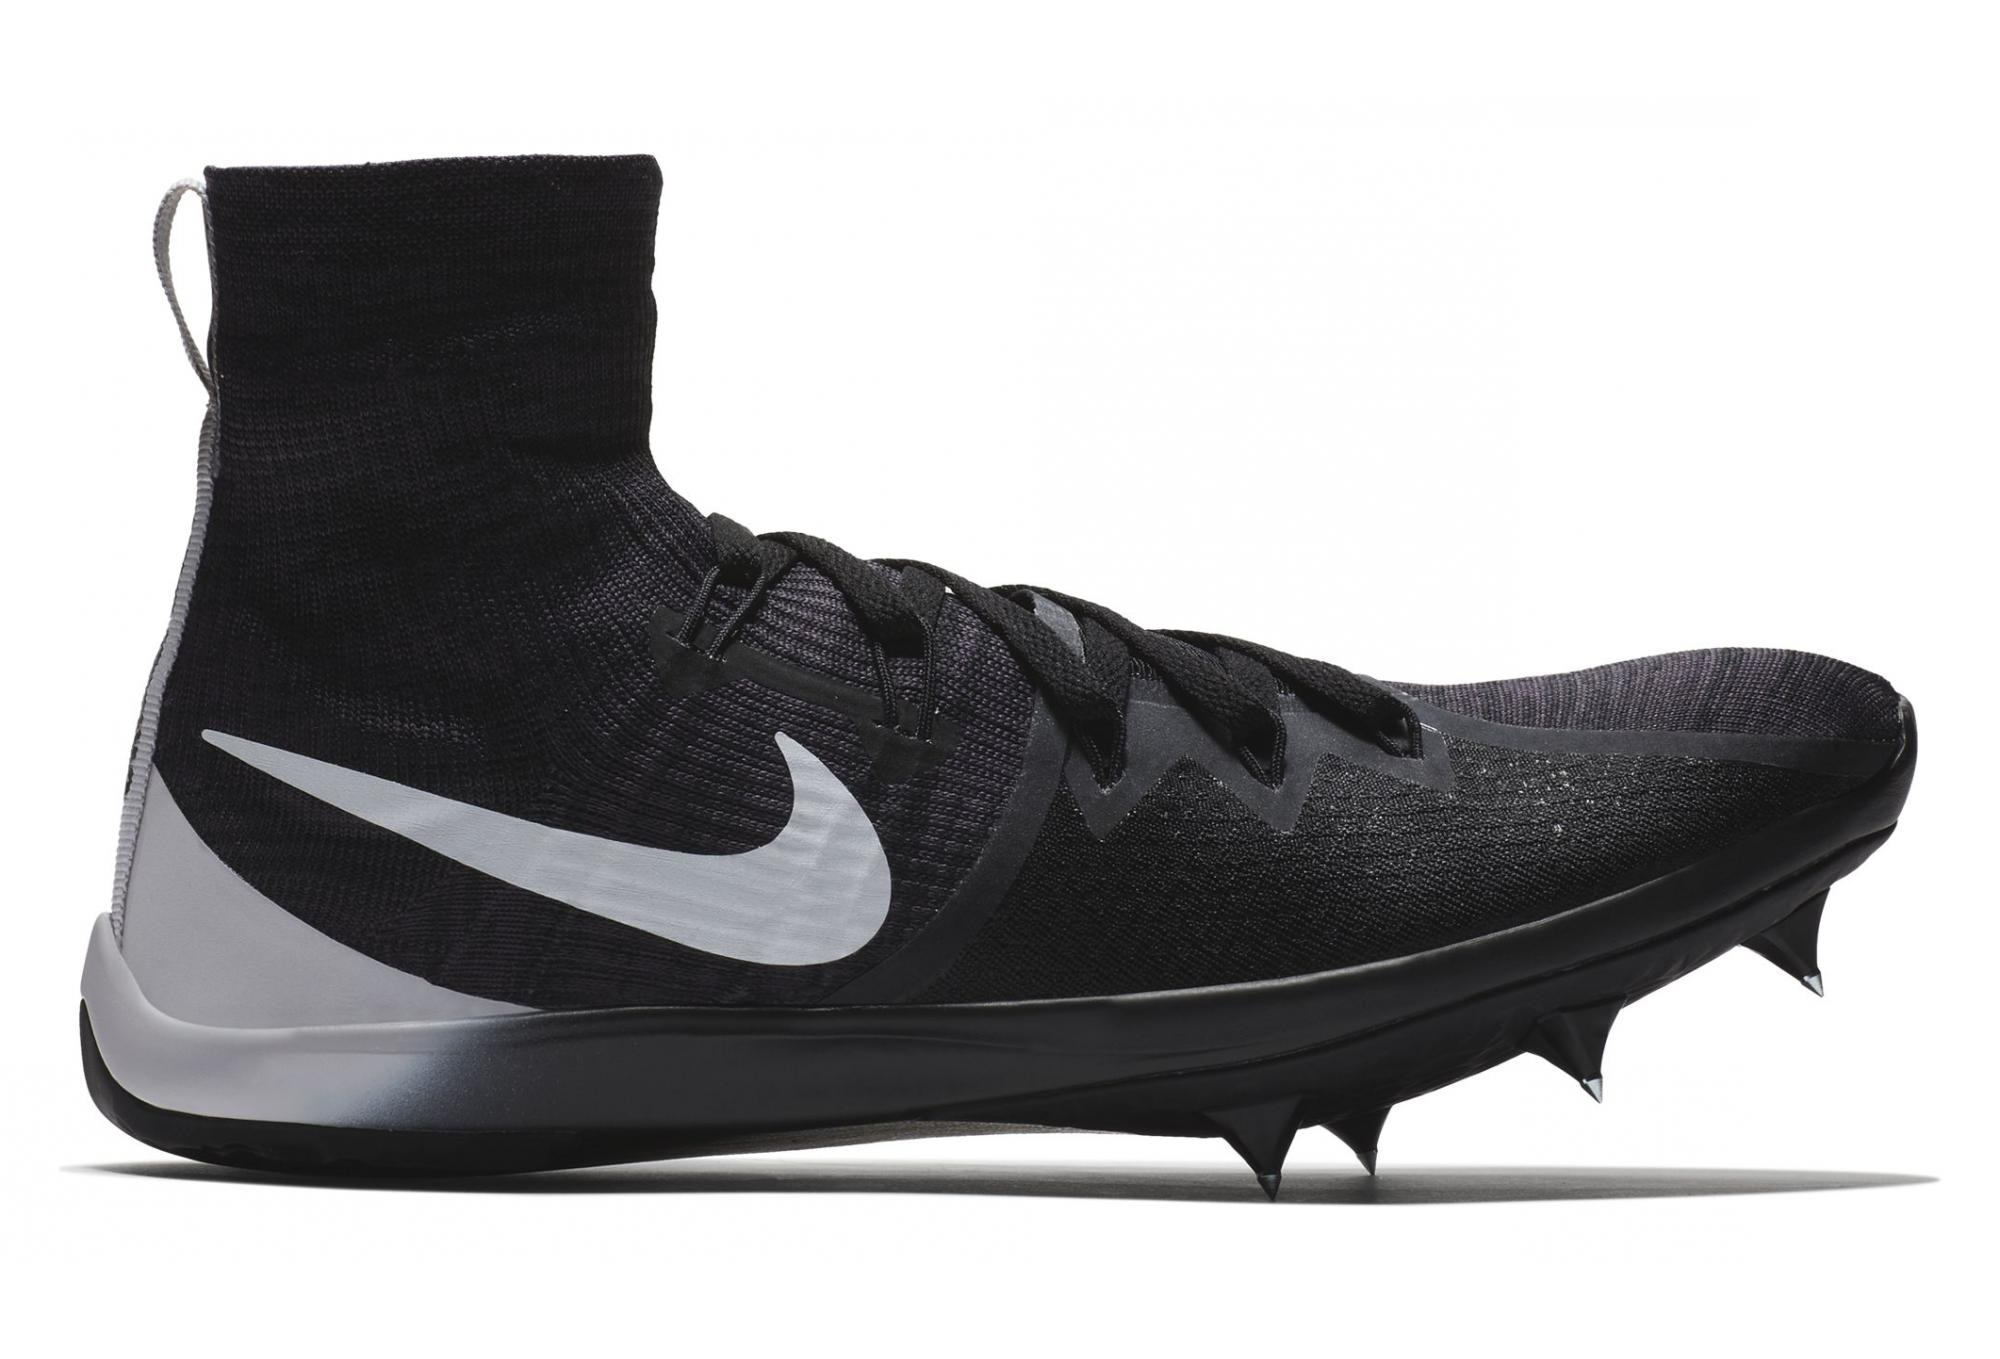 the latest 77c5f 33a76 Zapatillas Nike Zoom Victory 4 XC Negro Blanco Unisex | Alltricks.es